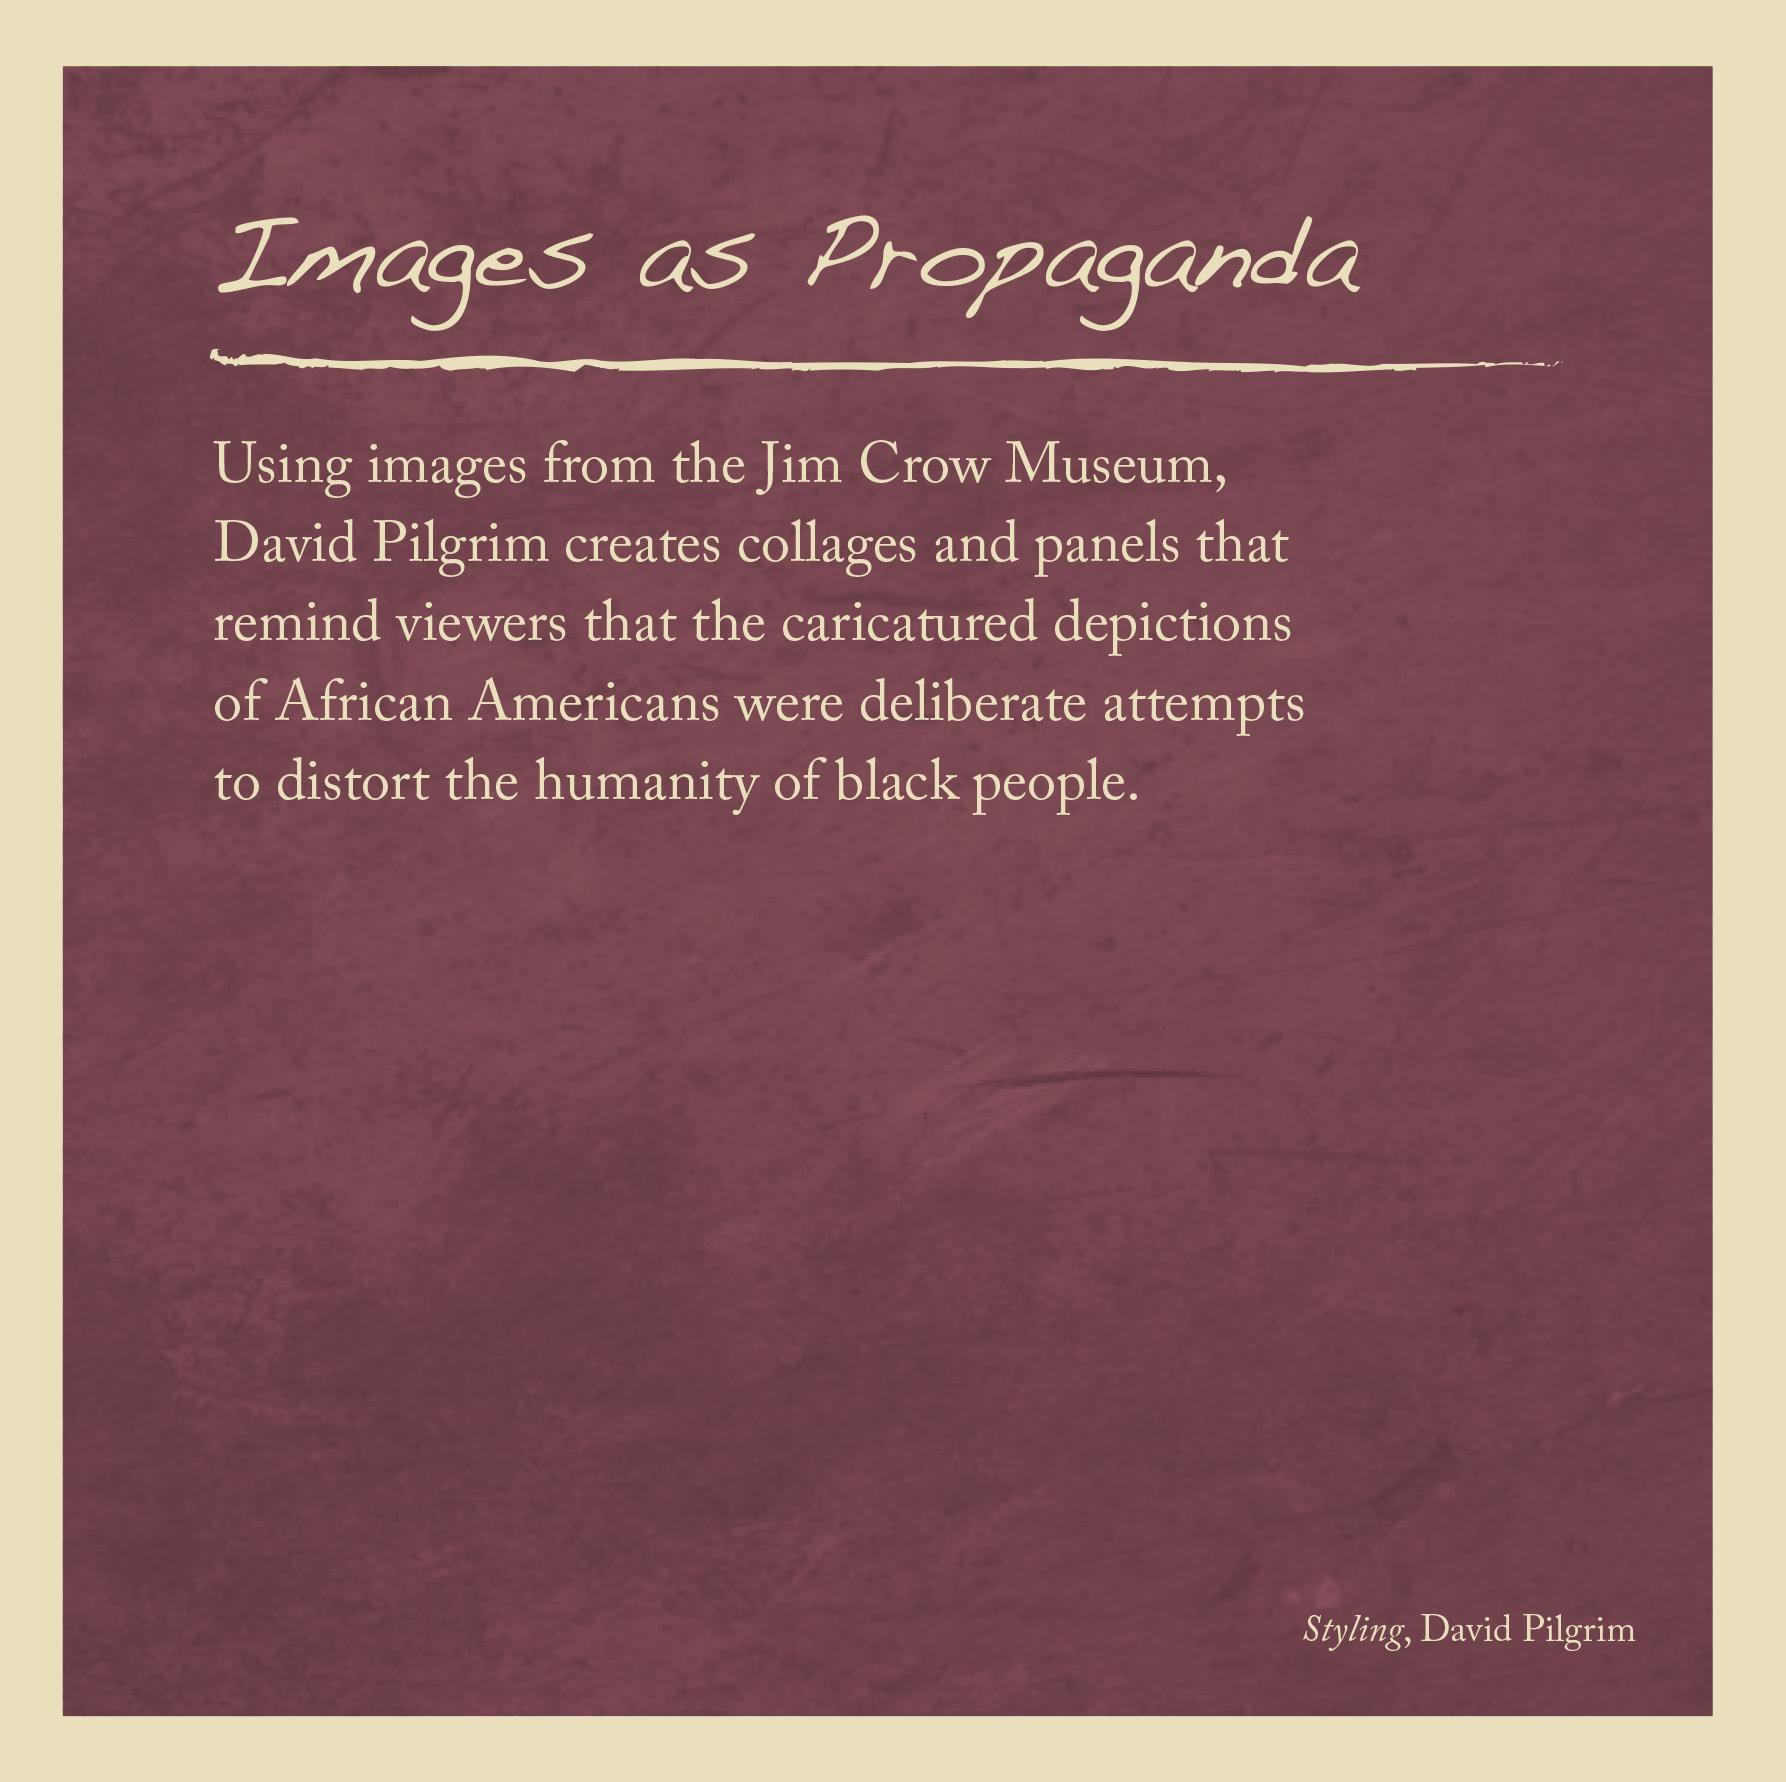 Images as Propaganda.jpg